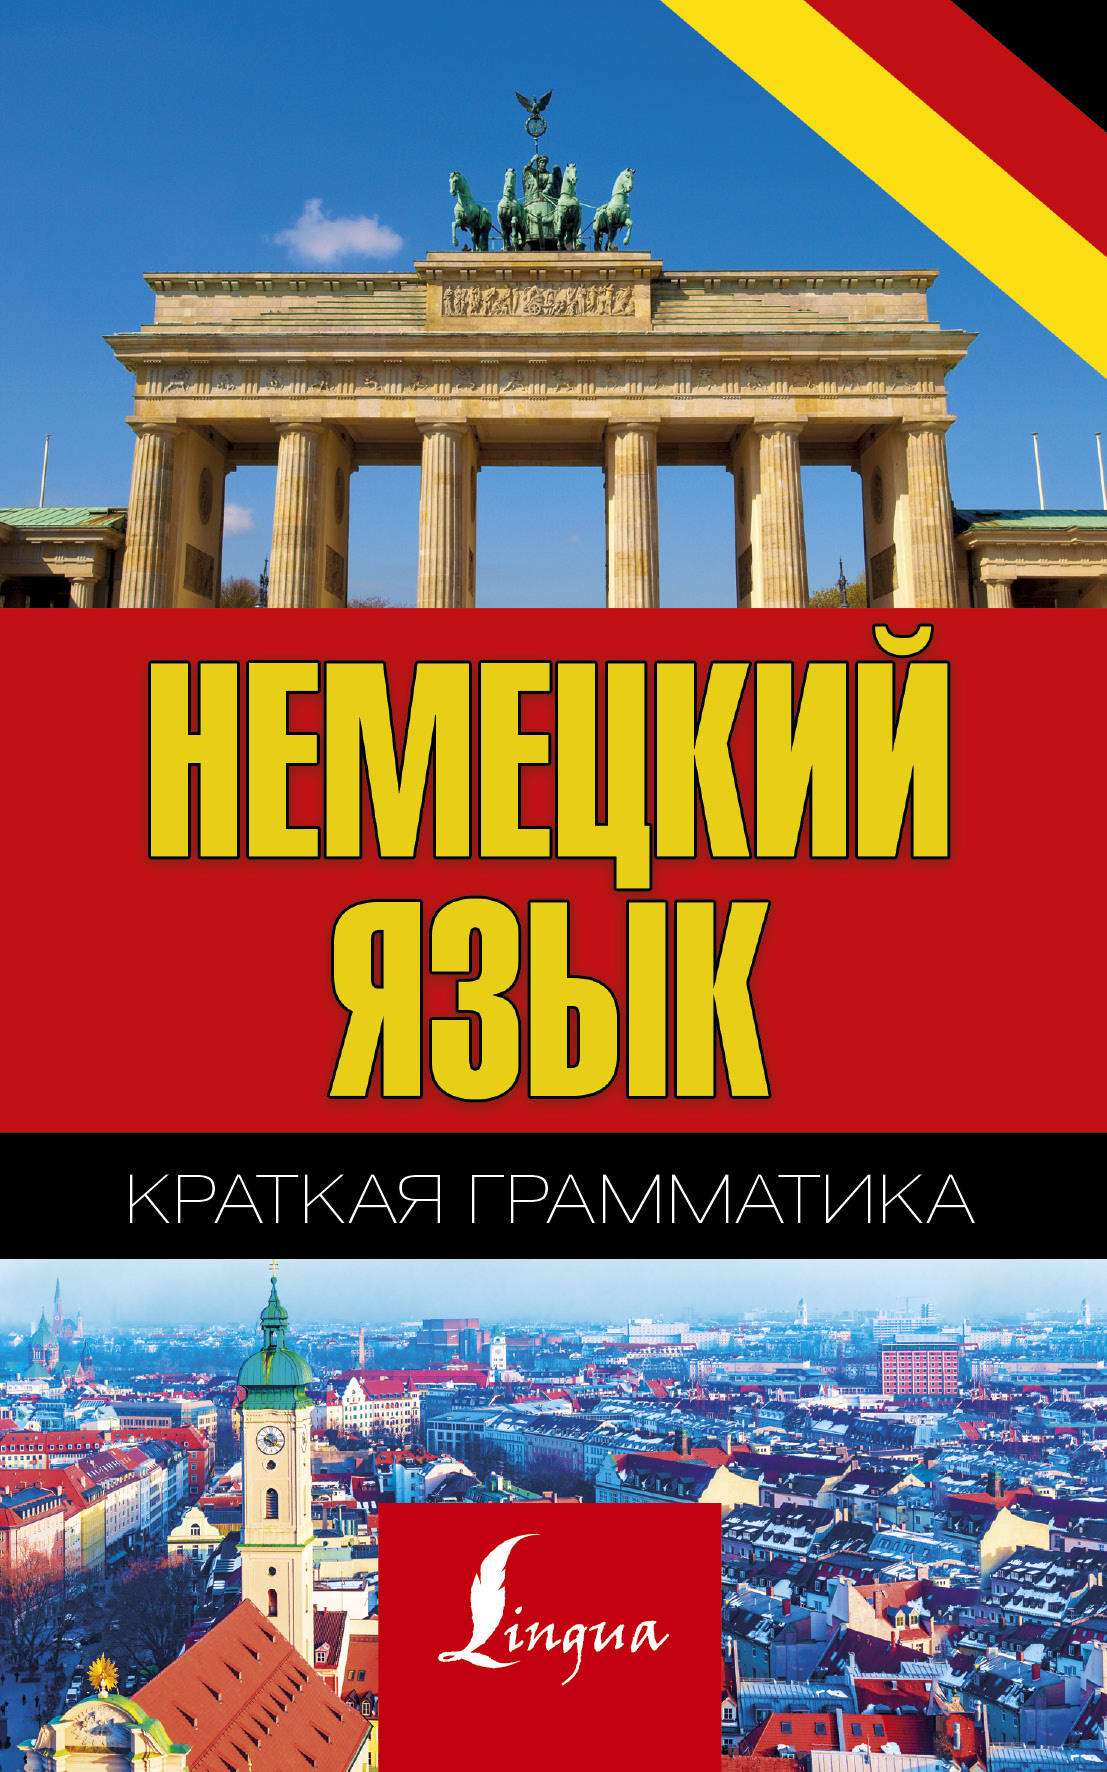 Матвеев С.А. Краткая грамматика немецкого языка грамматика немецкого языка в упражнениях cdpc